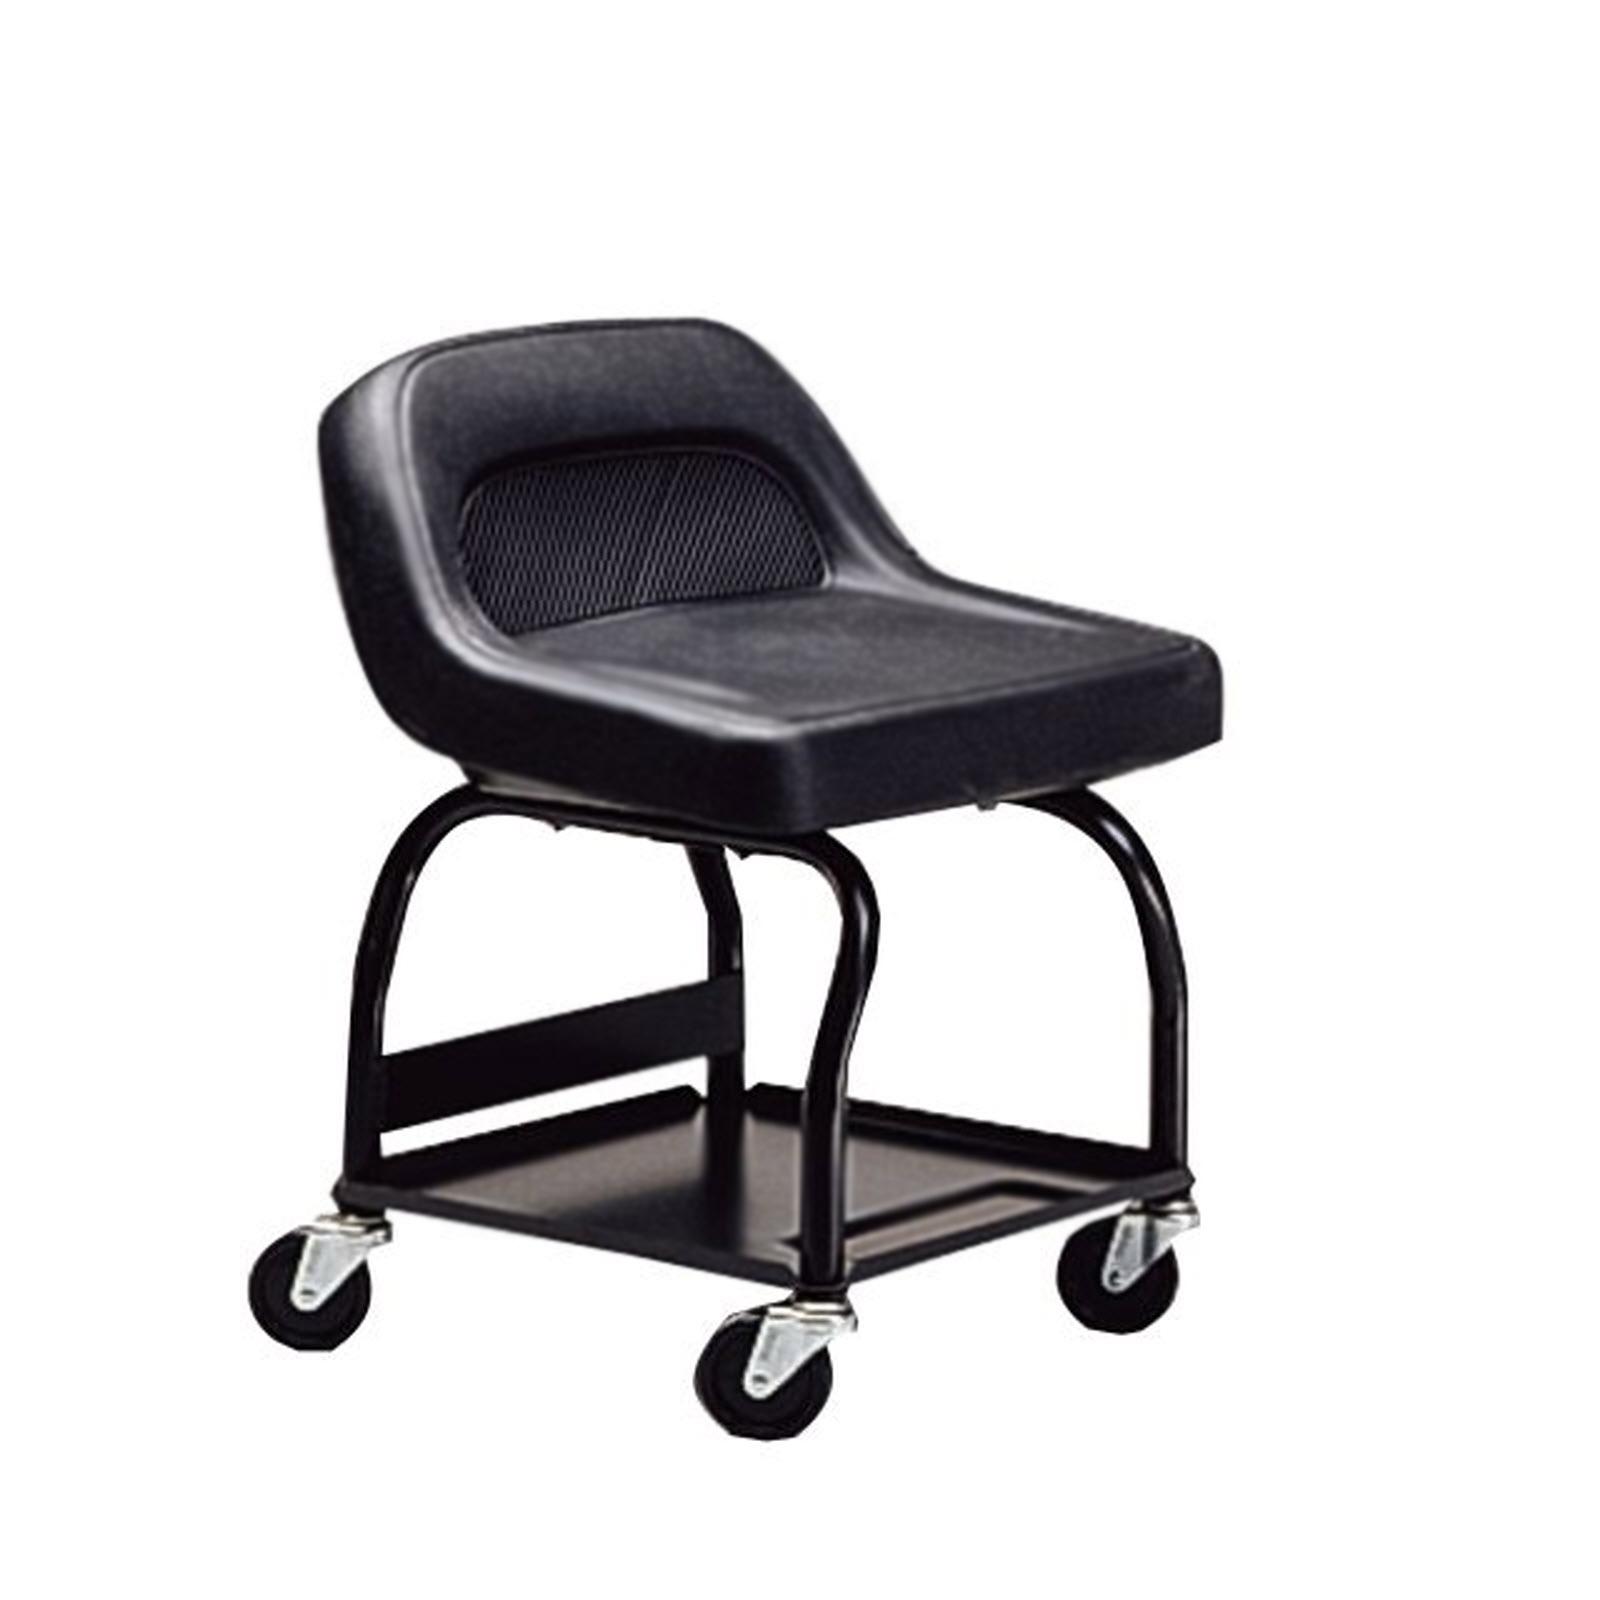 garage chairs rolling unique bean bag craftsman creeper seat mechanics high rise